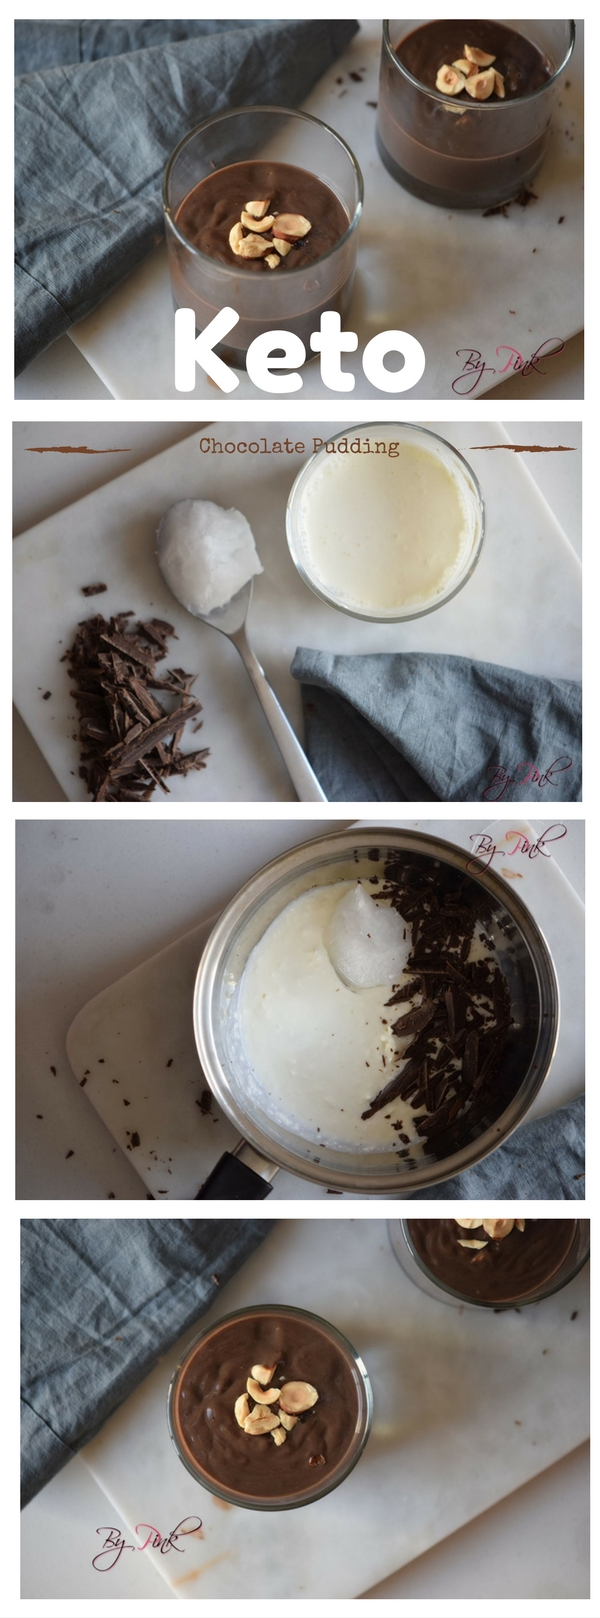 Keto Chocolate Pudding